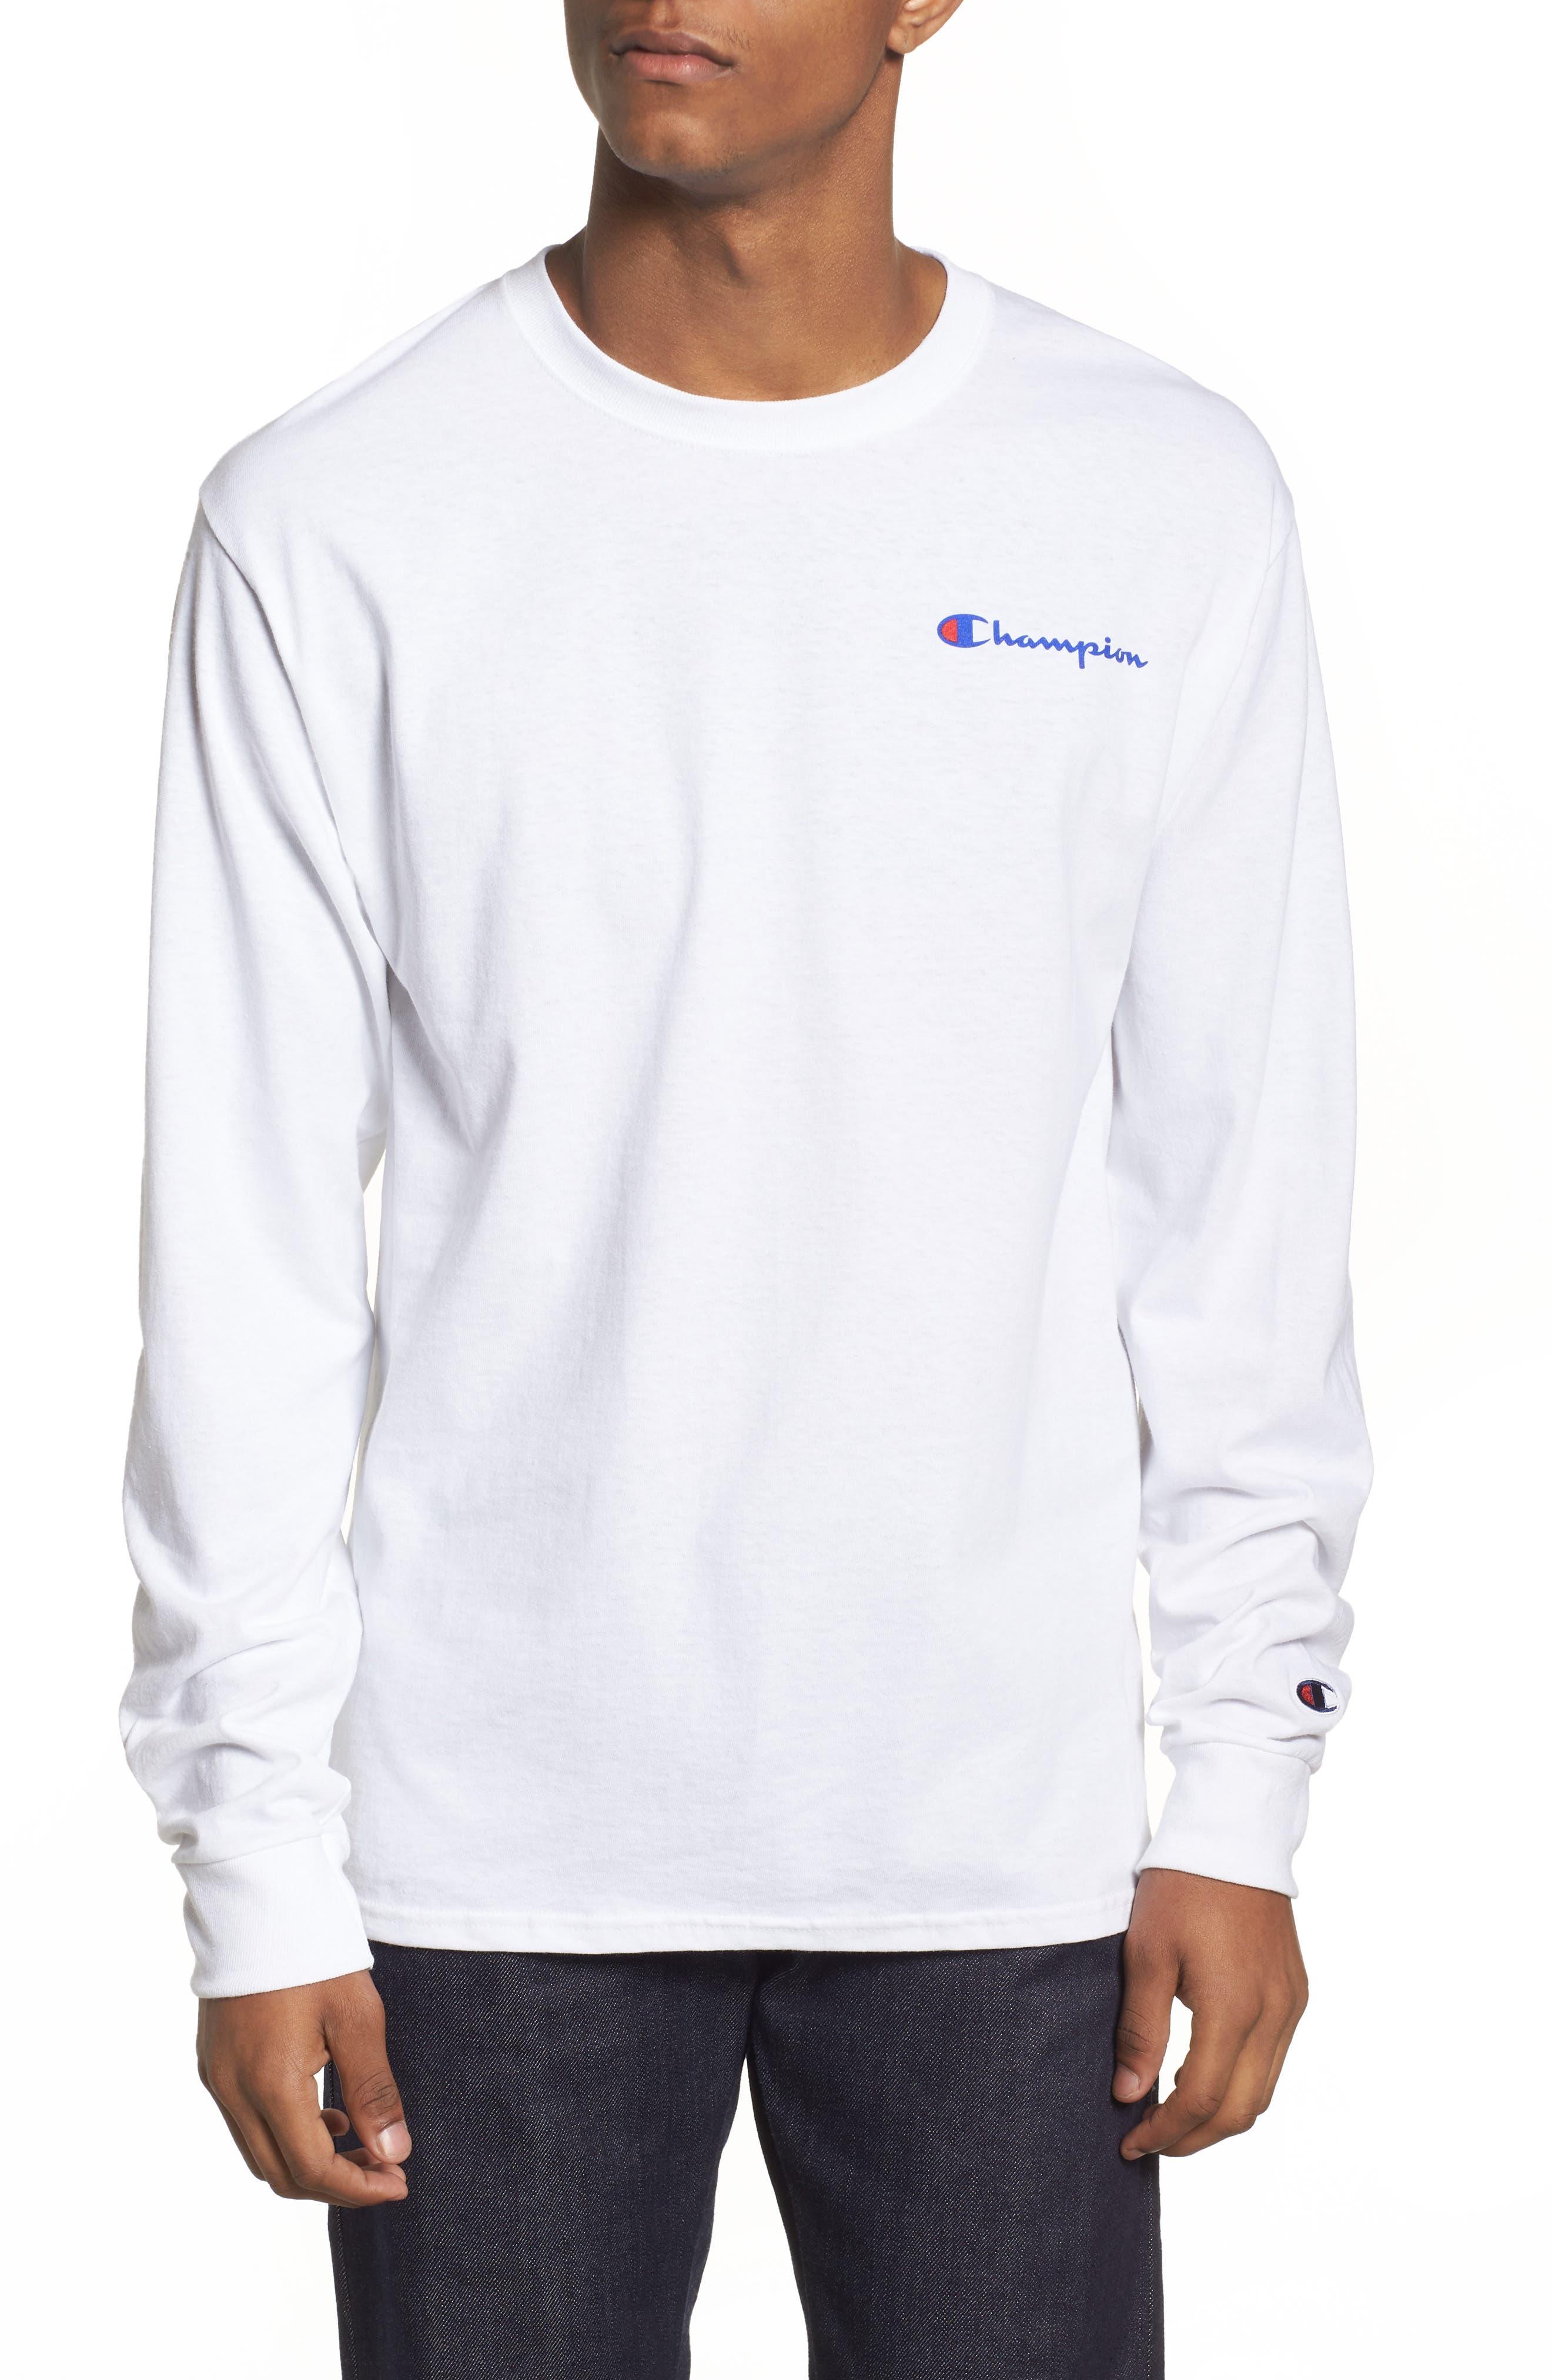 Snoopy Unisex Long Sleeve T-Shirt,                             Main thumbnail 1, color,                             100